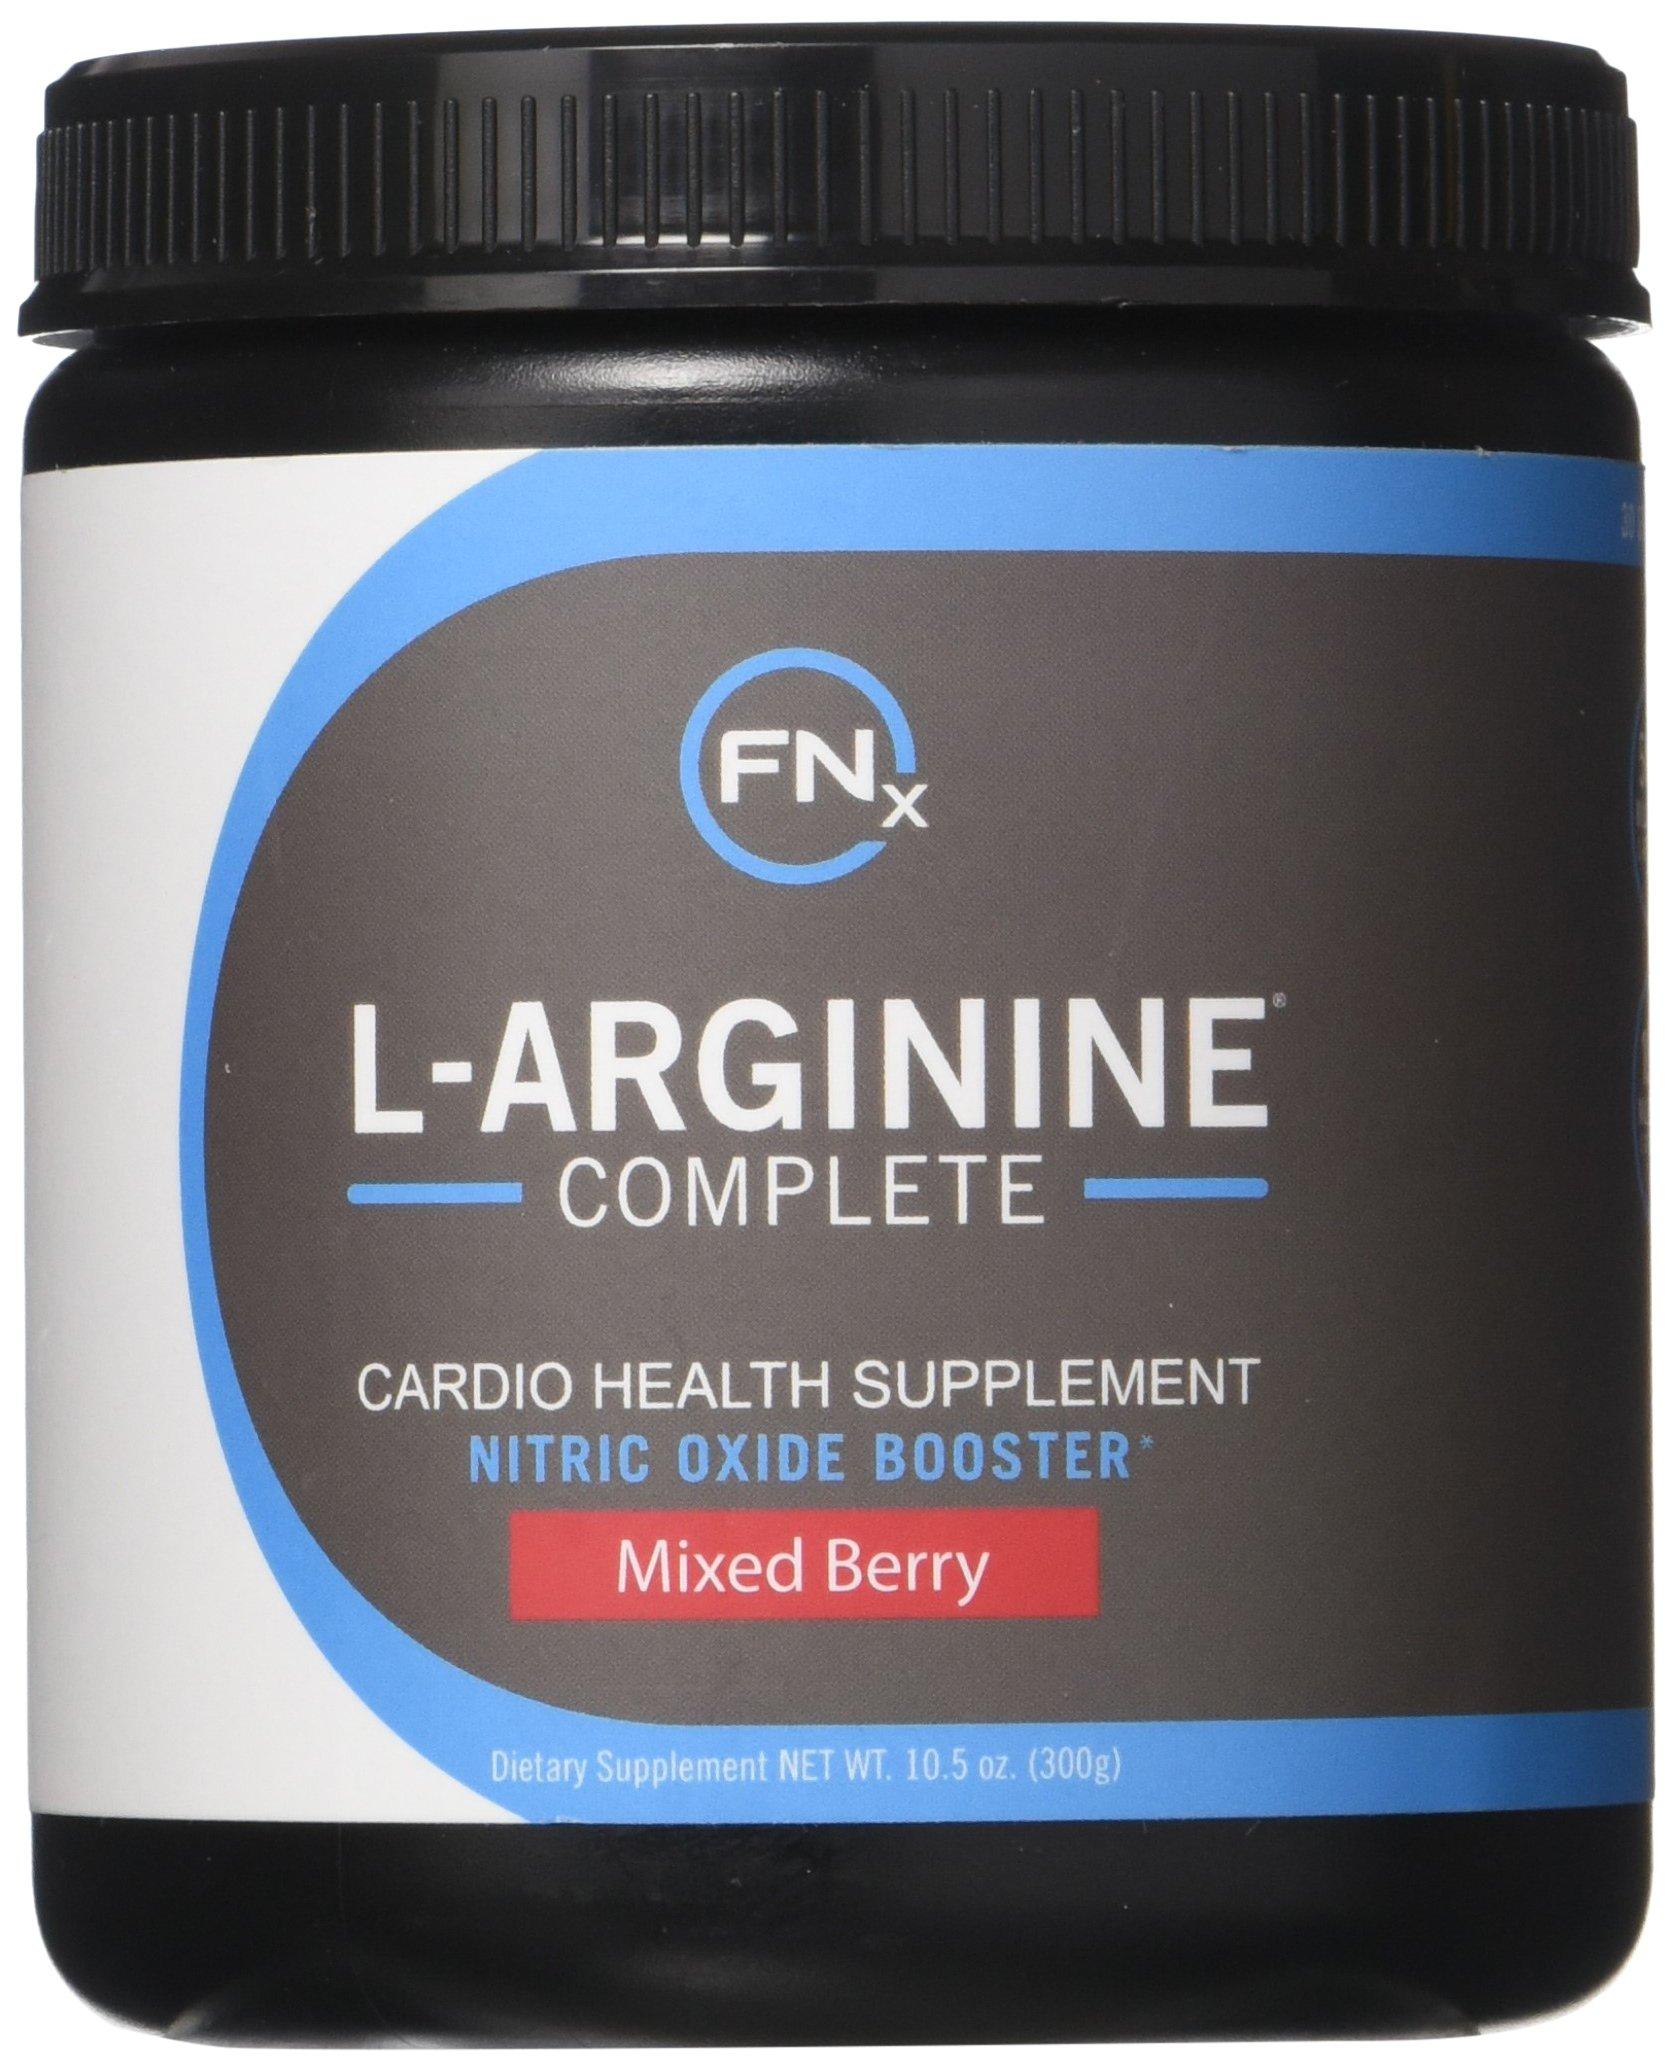 Fenix Nutrition - FNX L-Arginine Complete - Cardio Health Formula - Contains L-Citrulline - Enhance Effects Of Nitric Oxide - Secret Weapon For Libido - Mixed Berry - 3 Jars